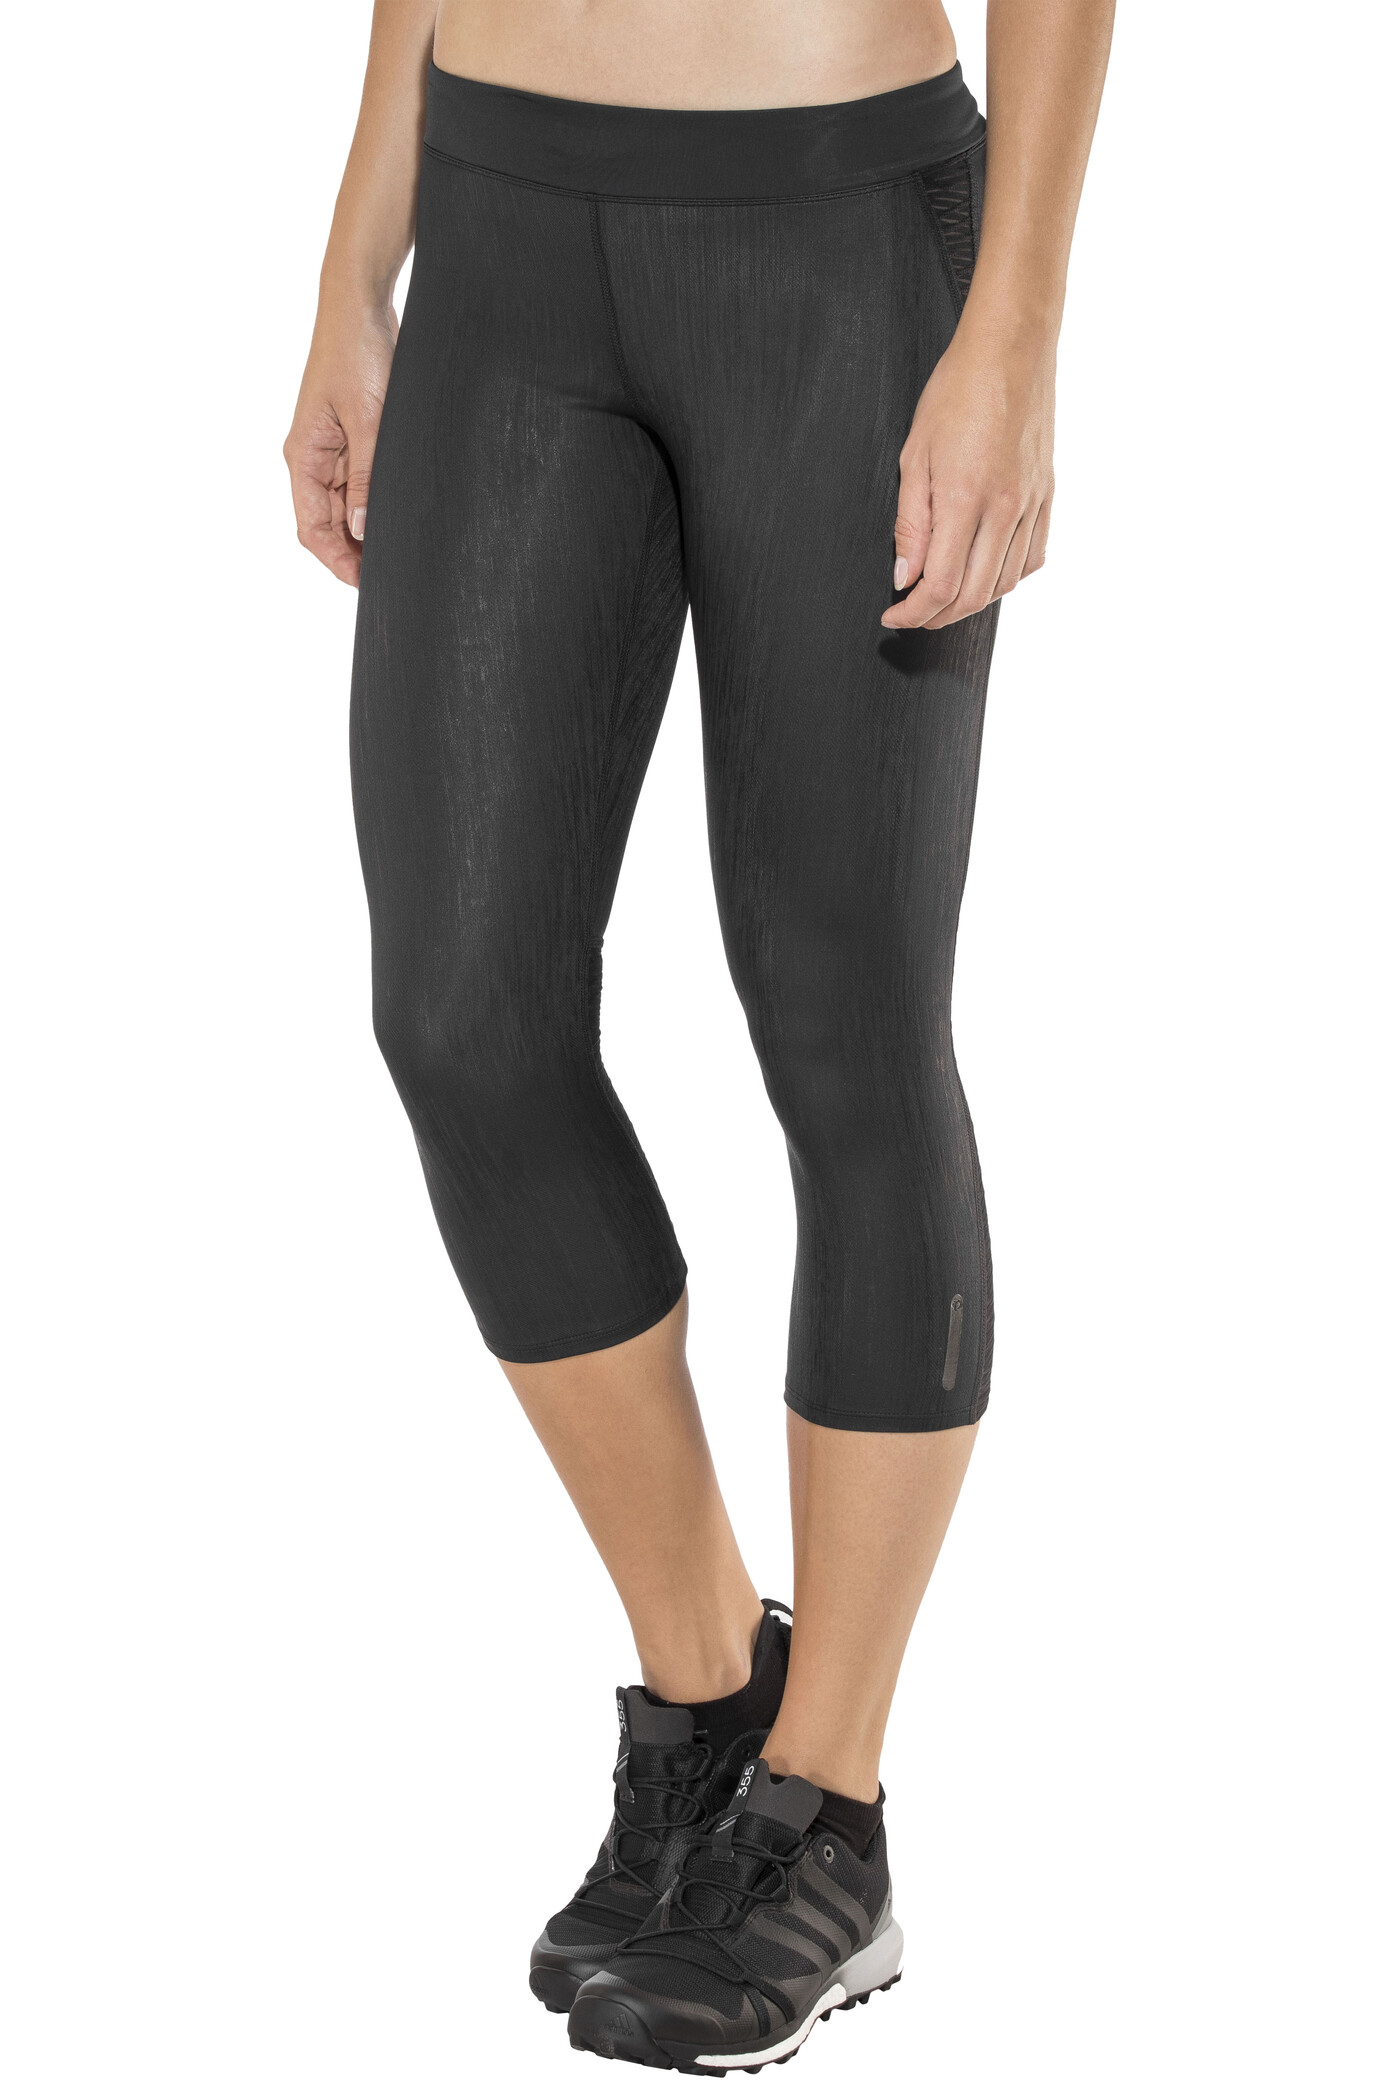 PEARL iZUMi Flash Løbeshorts Damer, black | Trousers